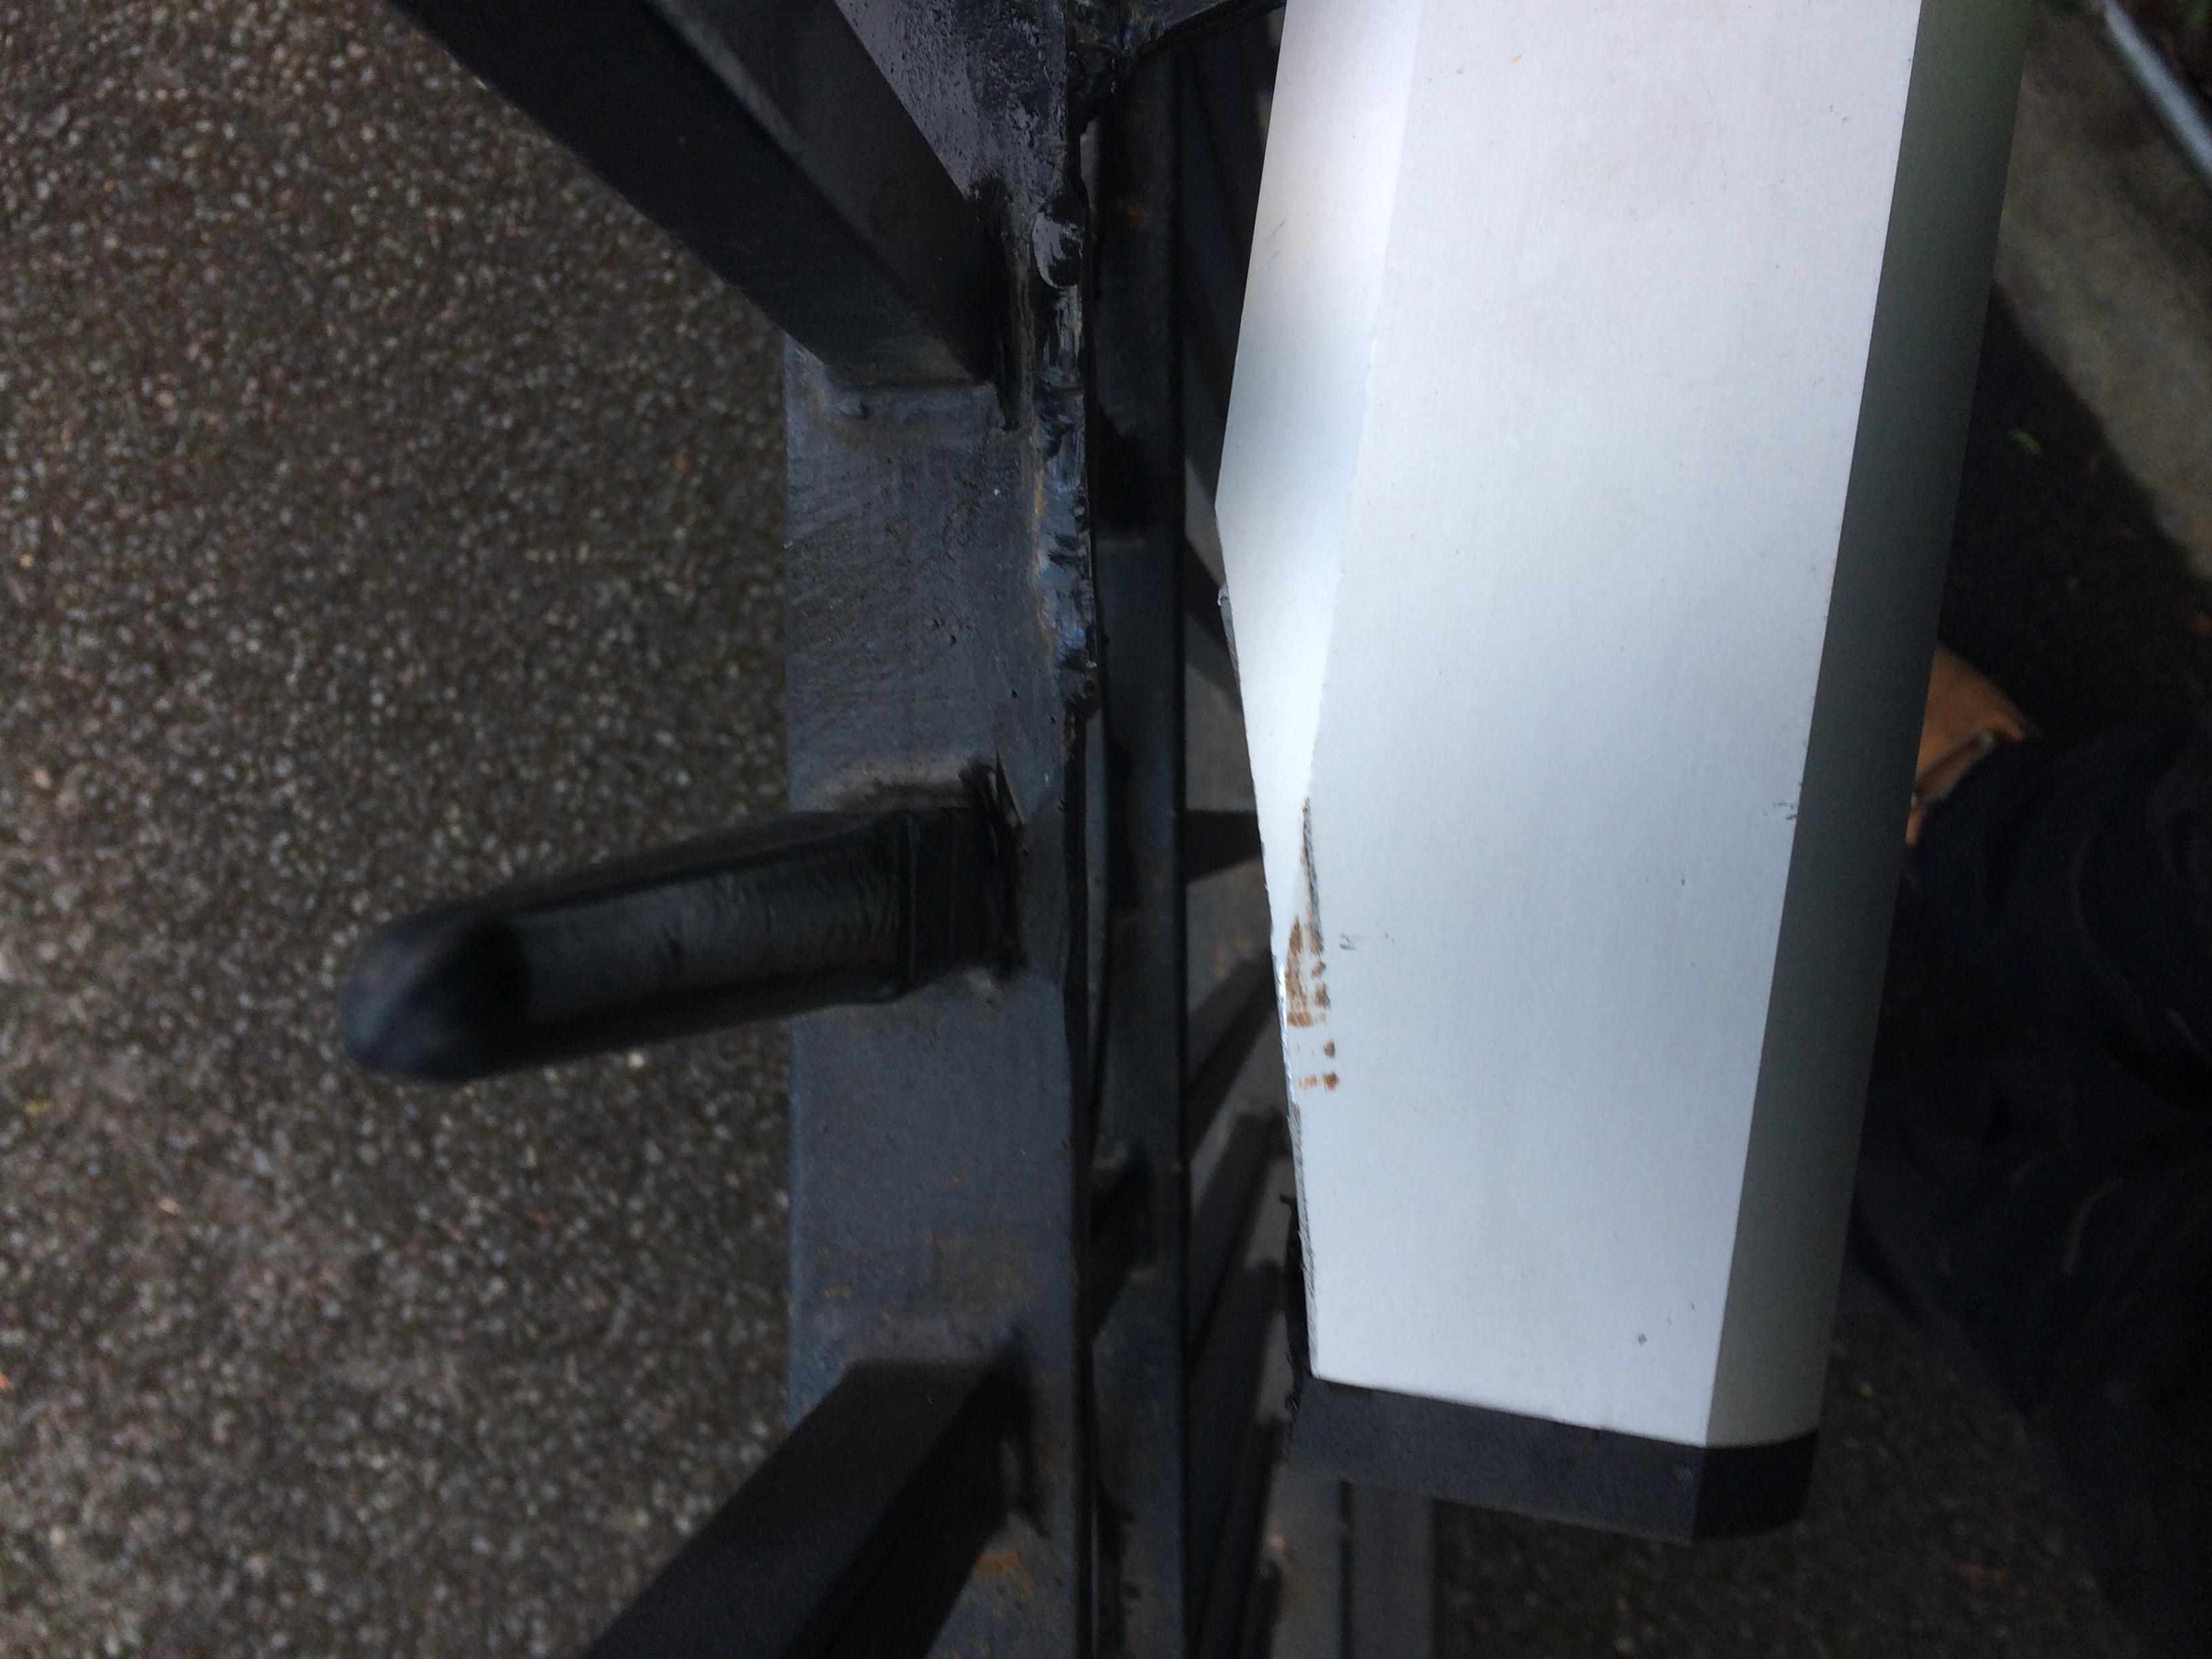 Gate motors badly installed